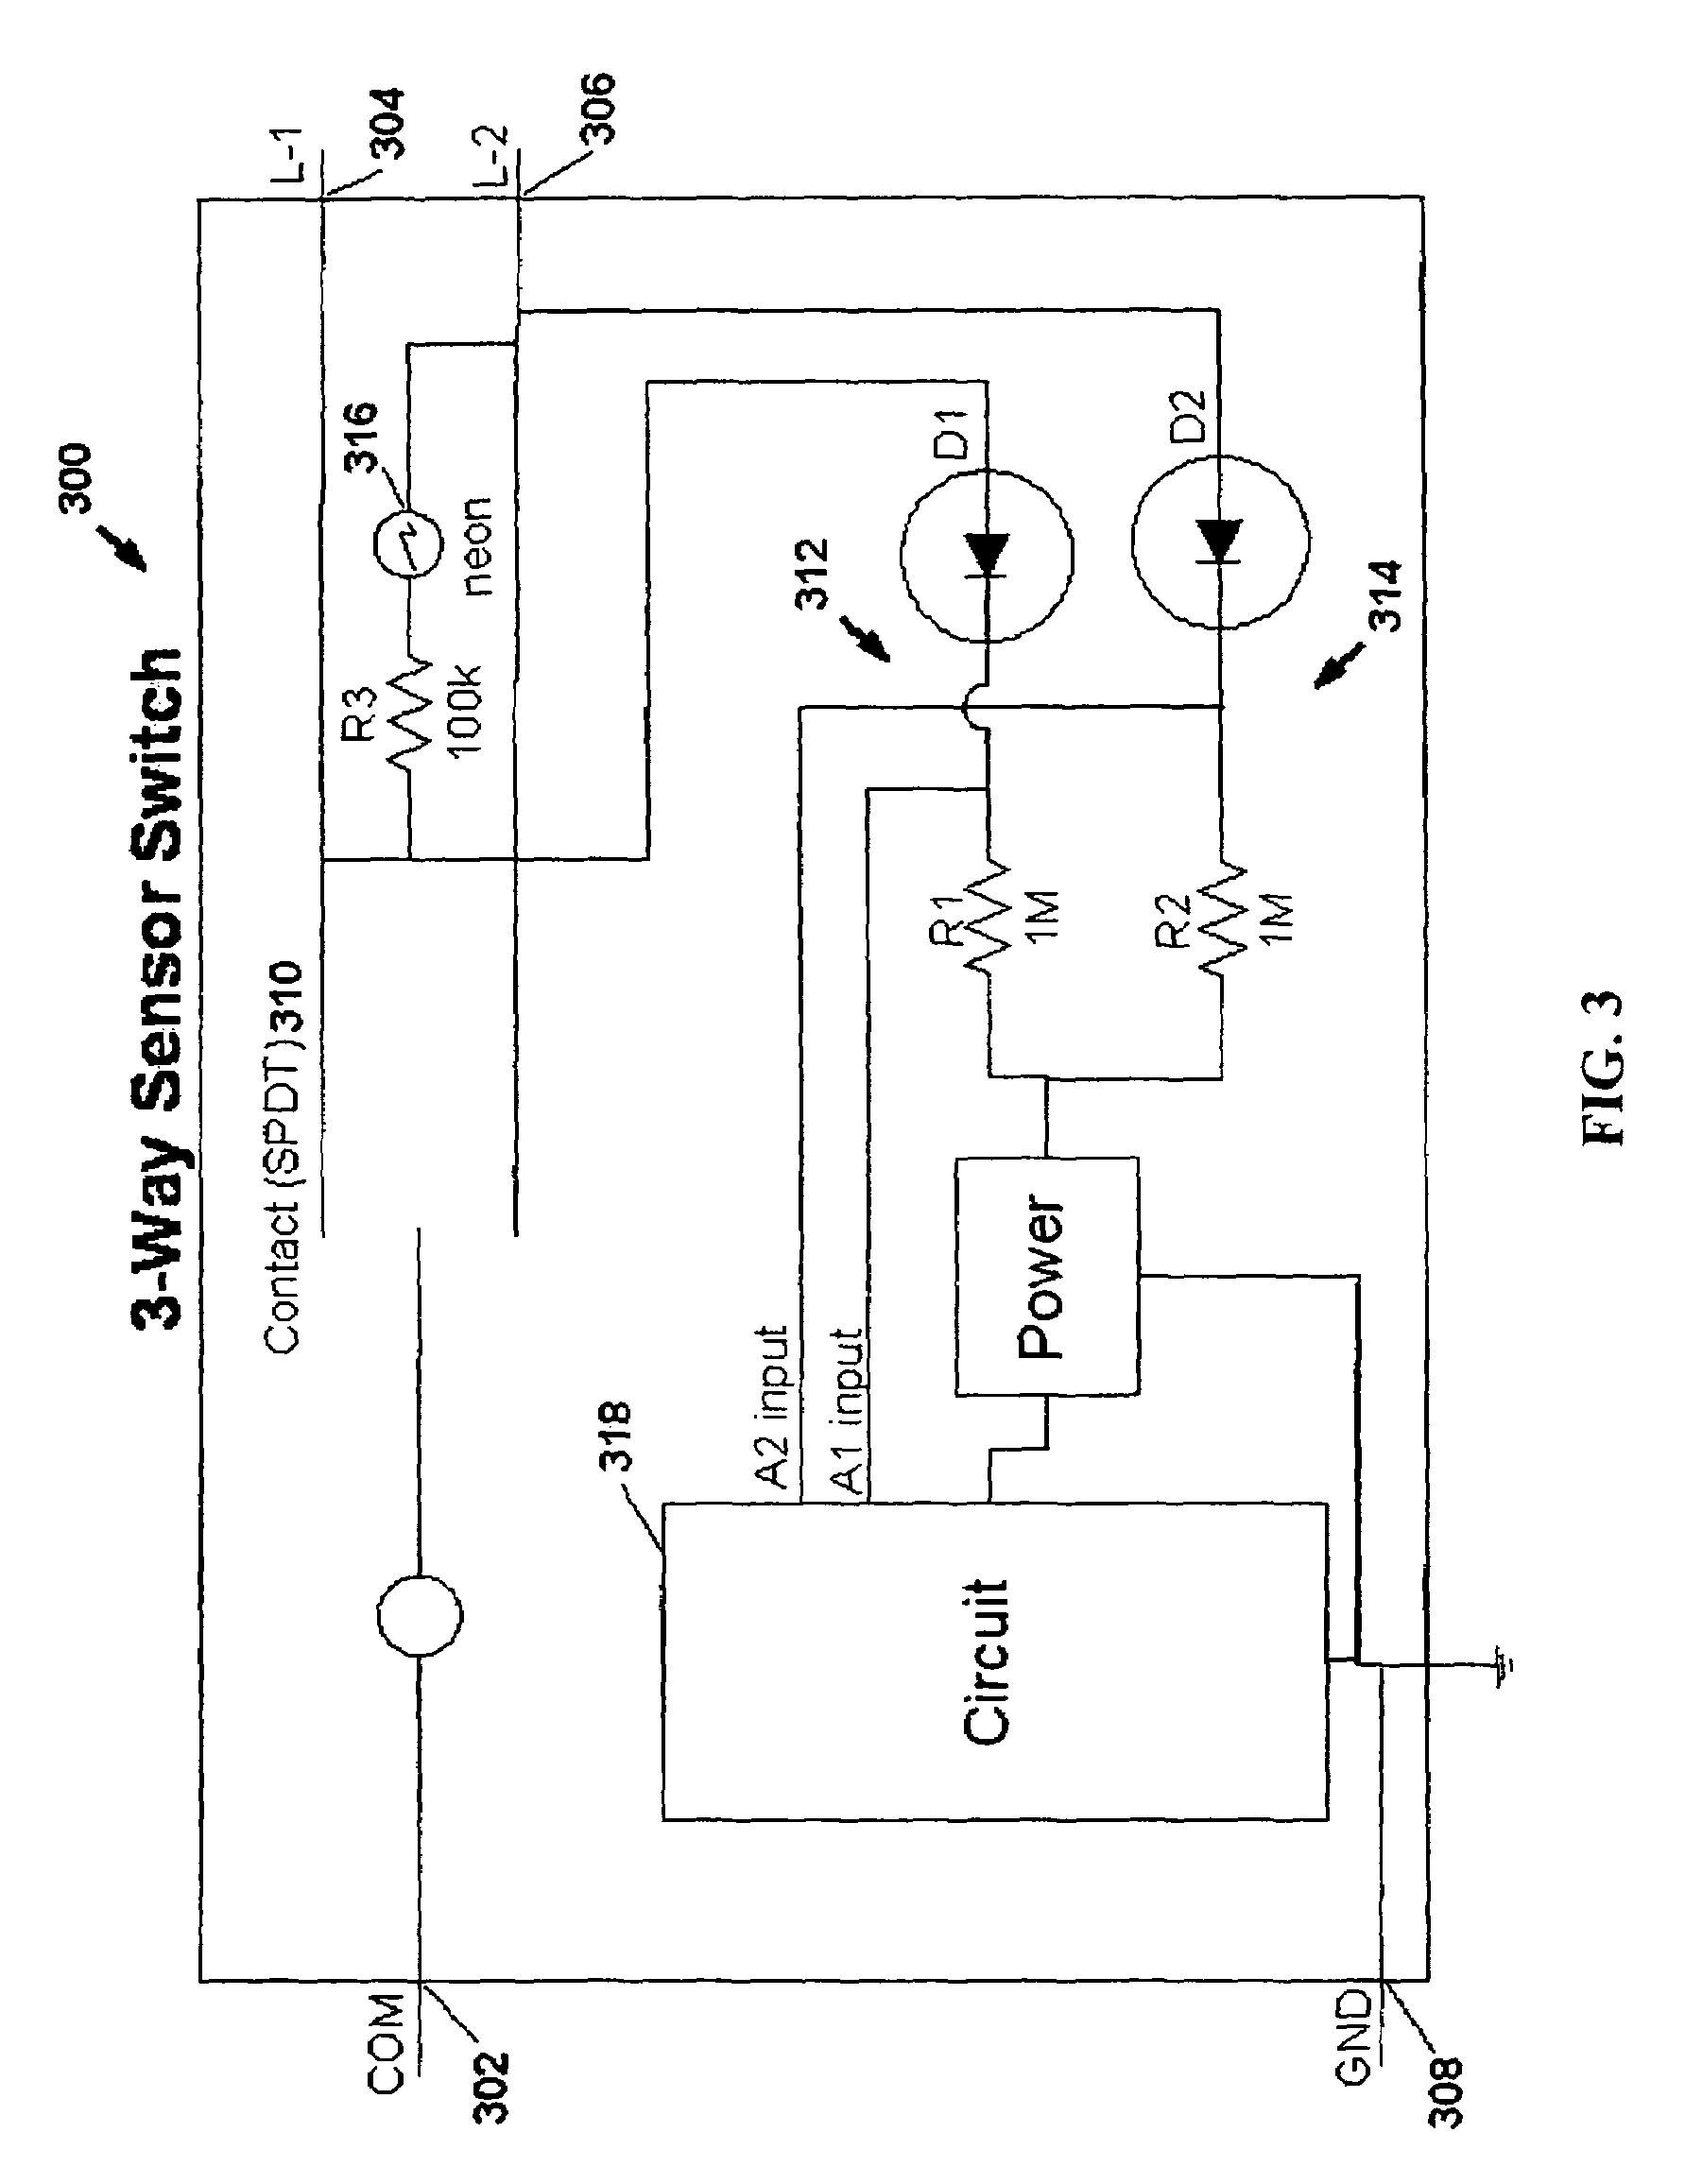 occupancy sensor power pack wiring diagram - motion sensor light wiring  diagram luxury pir motion sensor